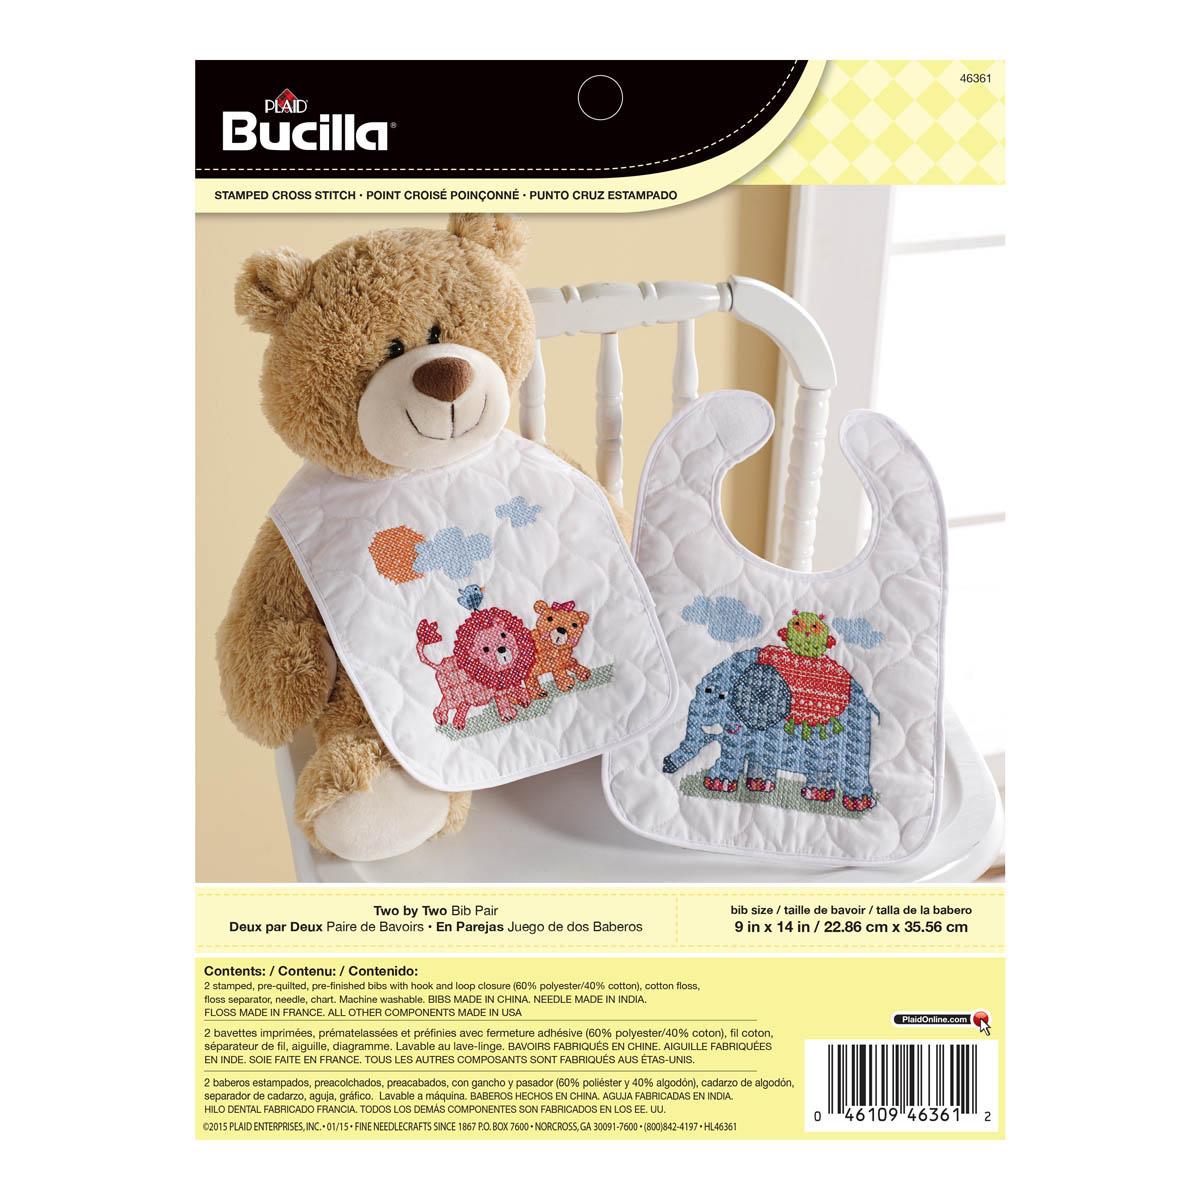 Bucilla ® Baby - Stamped Cross Stitch - Crib Ensembles - Two By Two - Bib Pair Kit